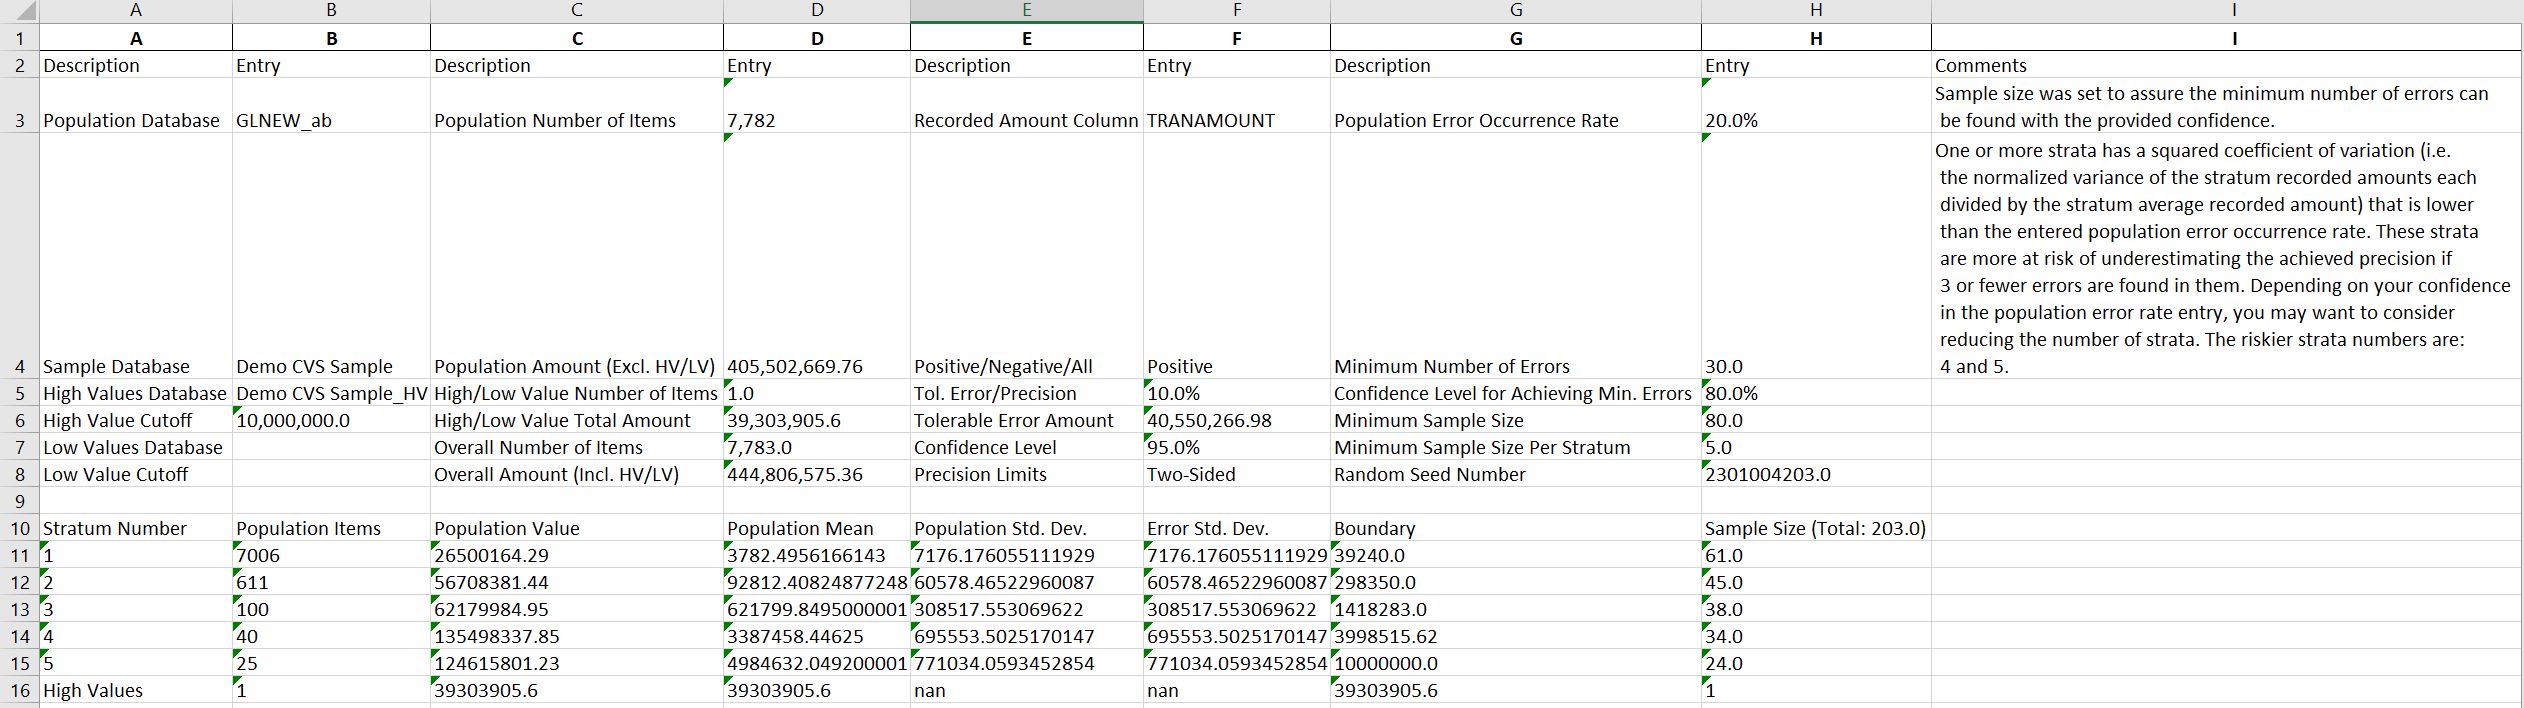 variable sample evaluation spec file